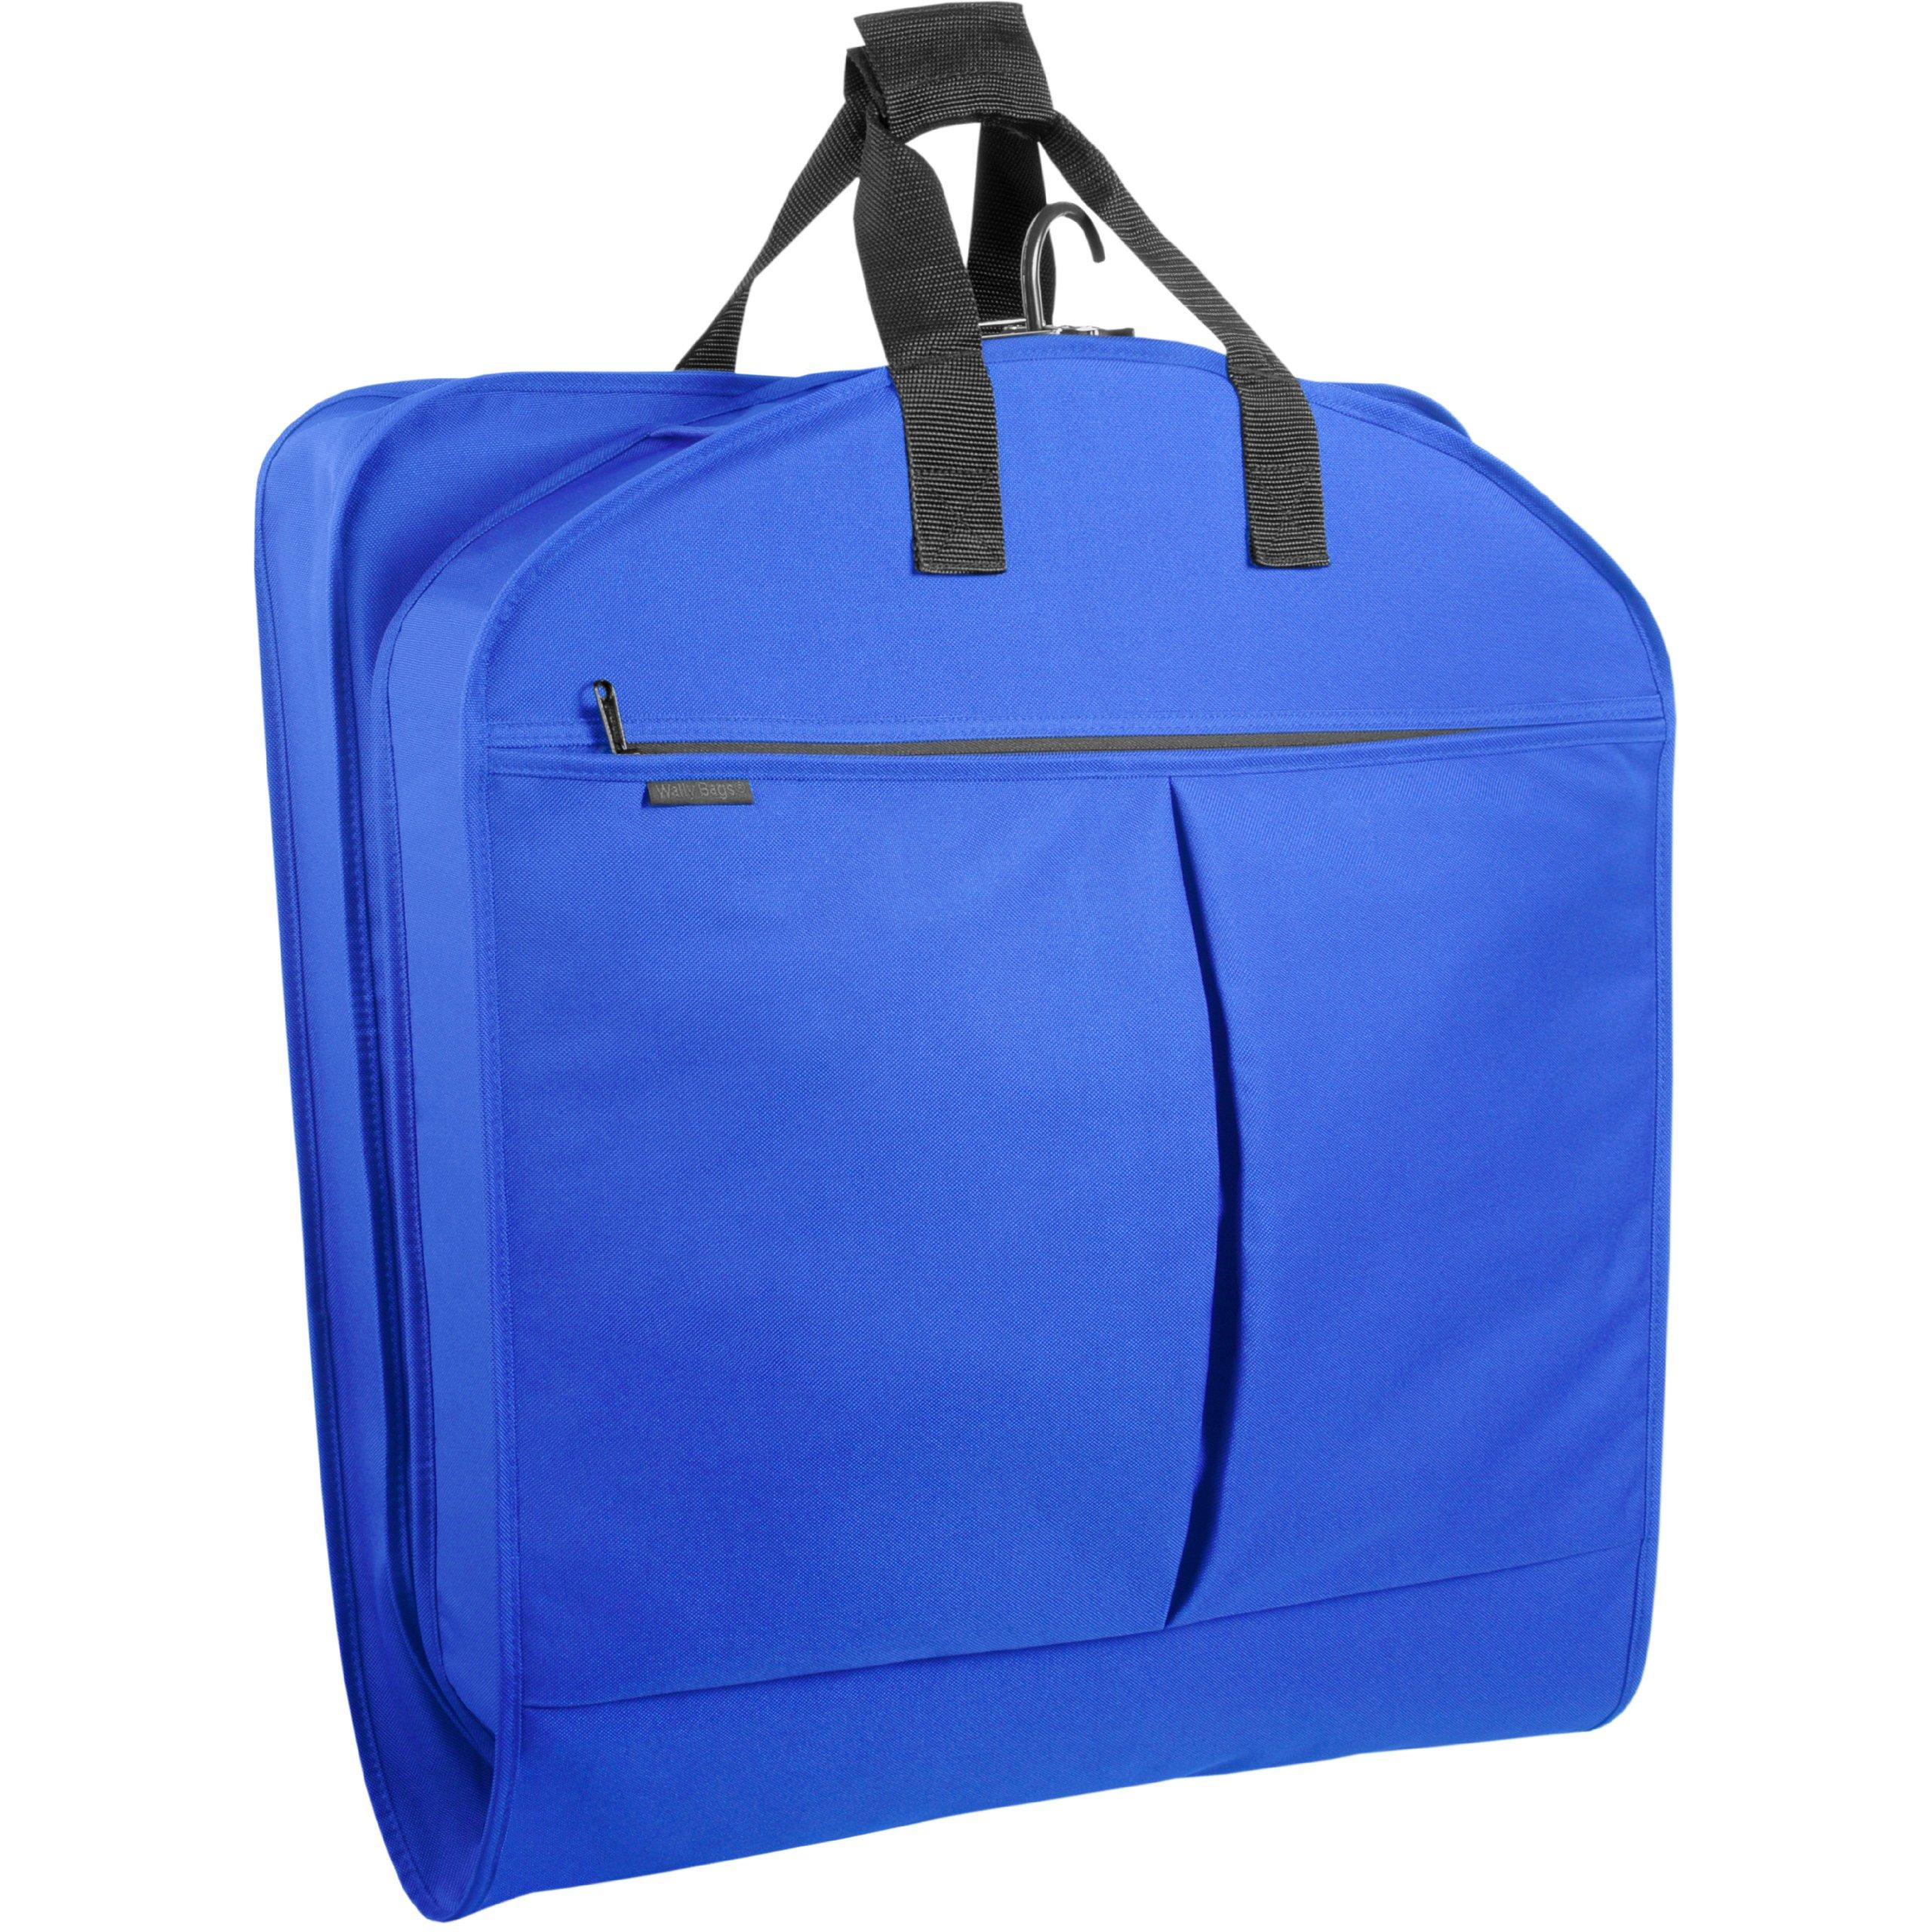 WallyBags Luggage 52'' Garment Bag with Pockets, Royal Blue